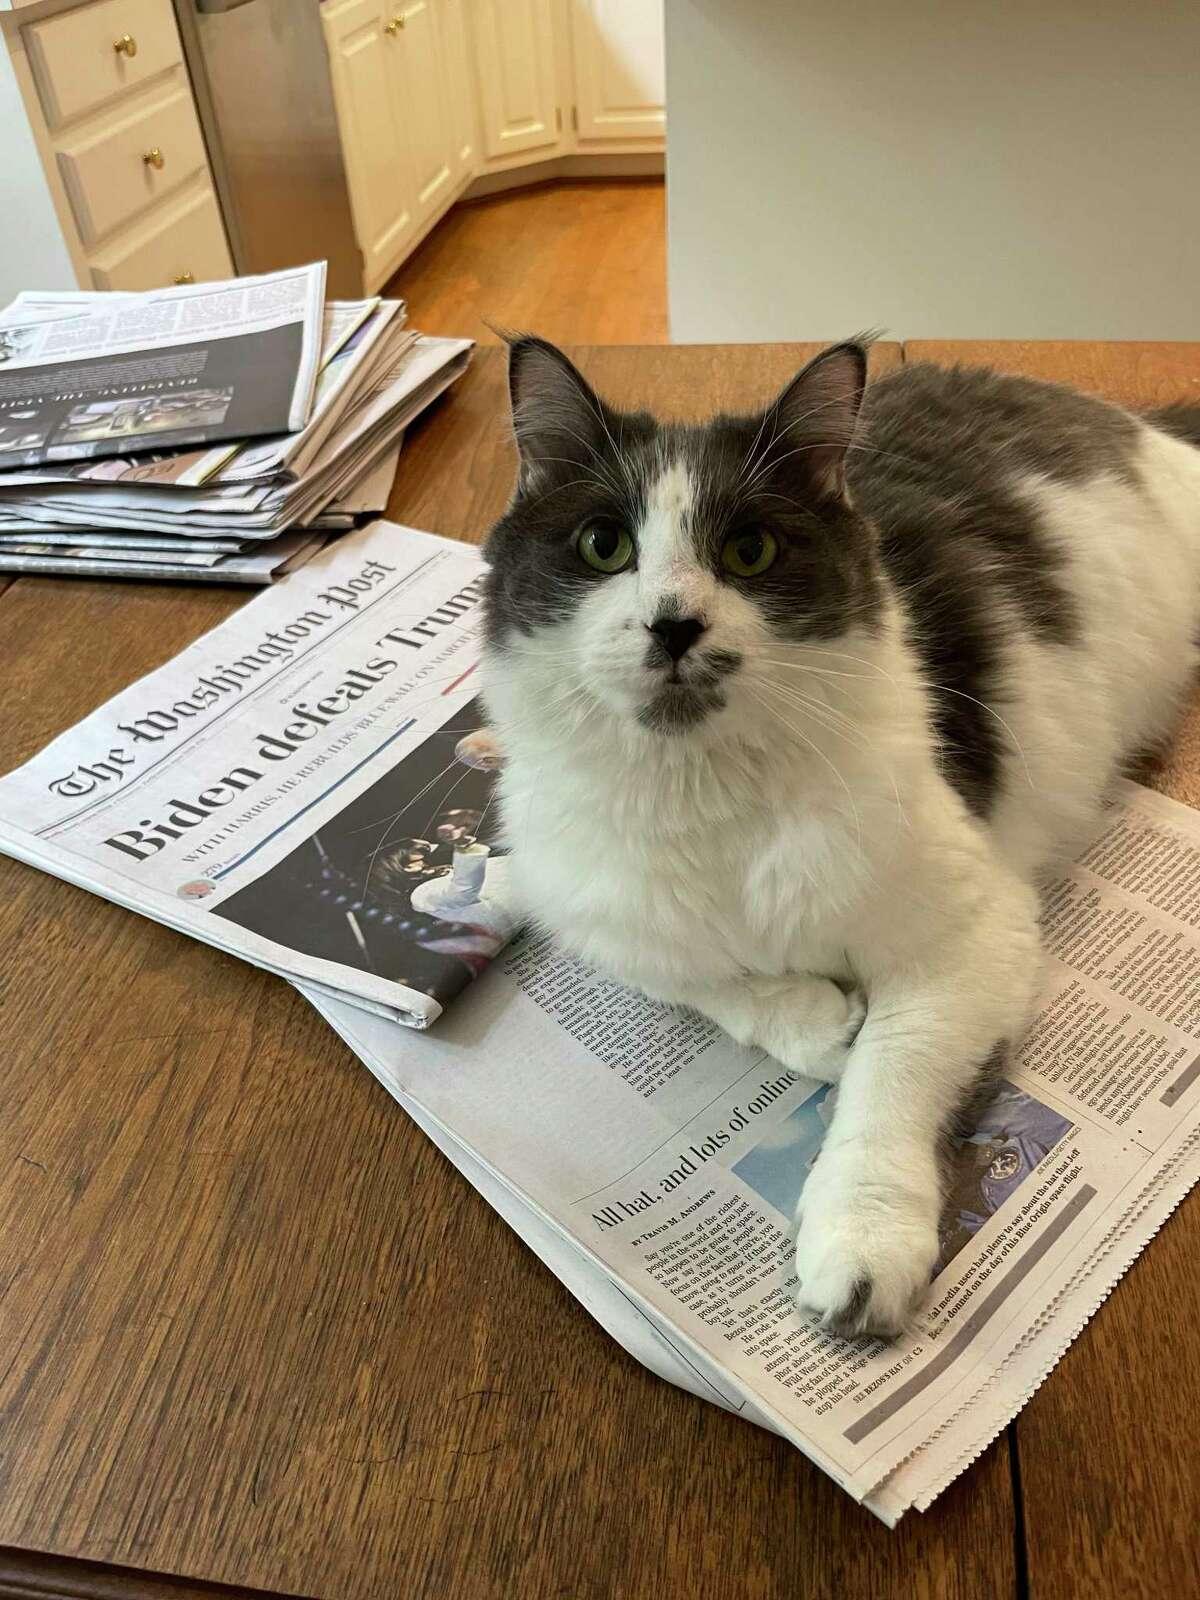 Sherwood the cat has so many phobias - doorbells, aluminum foil - that owners Sue Roberts and Richard McCluney of Williamsburg, Va., are eternally vigilant.